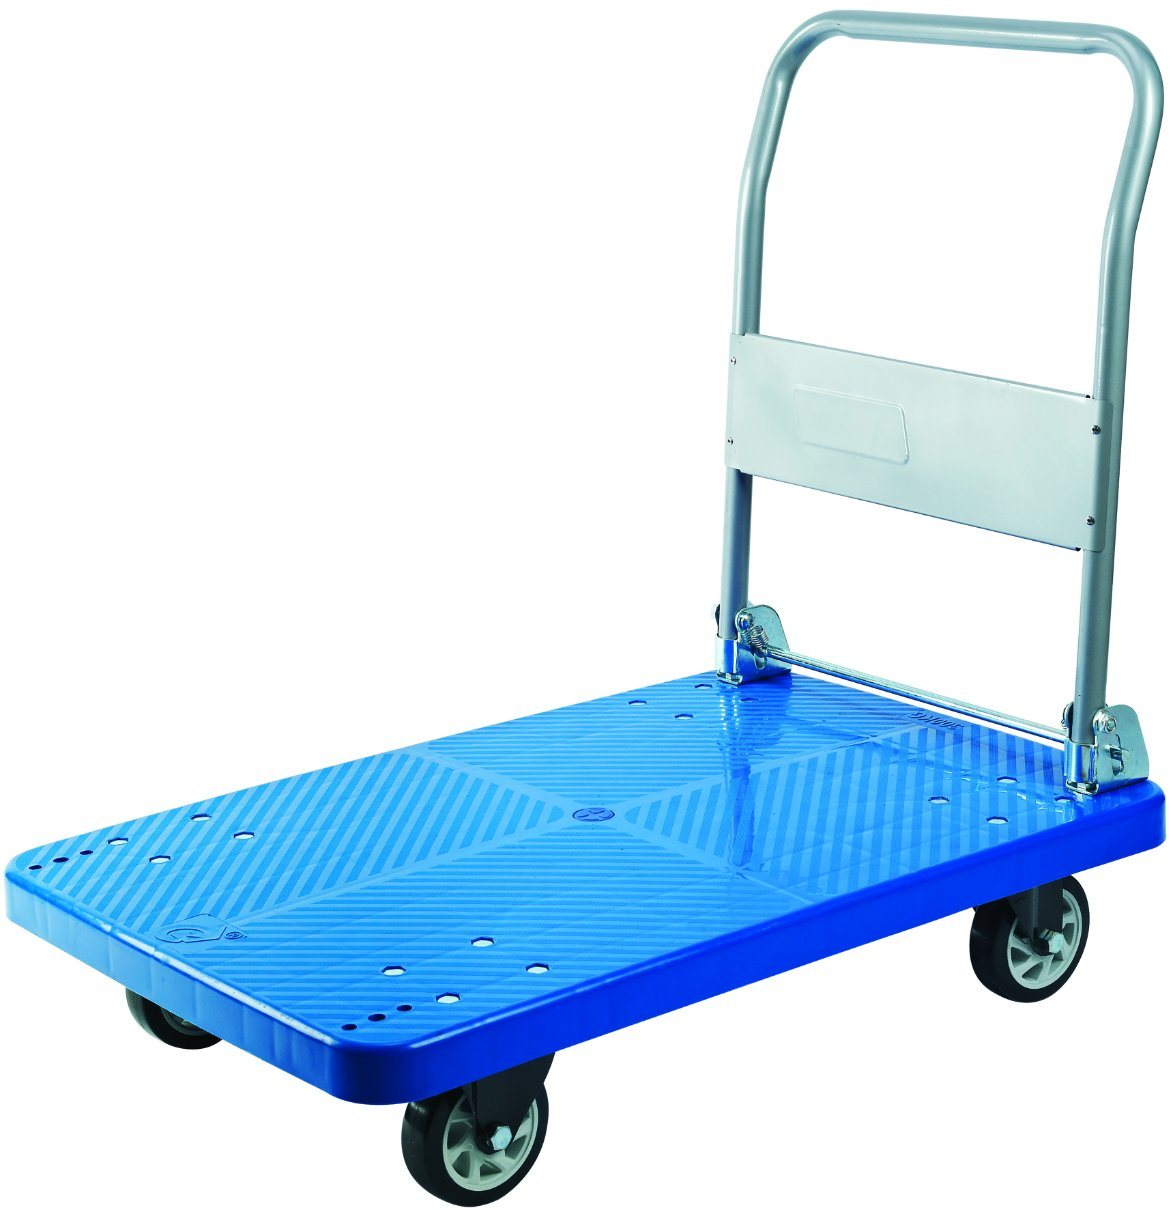 300kgs Blue Platform Trolley Pallet Hand Truck with PVC Wheels